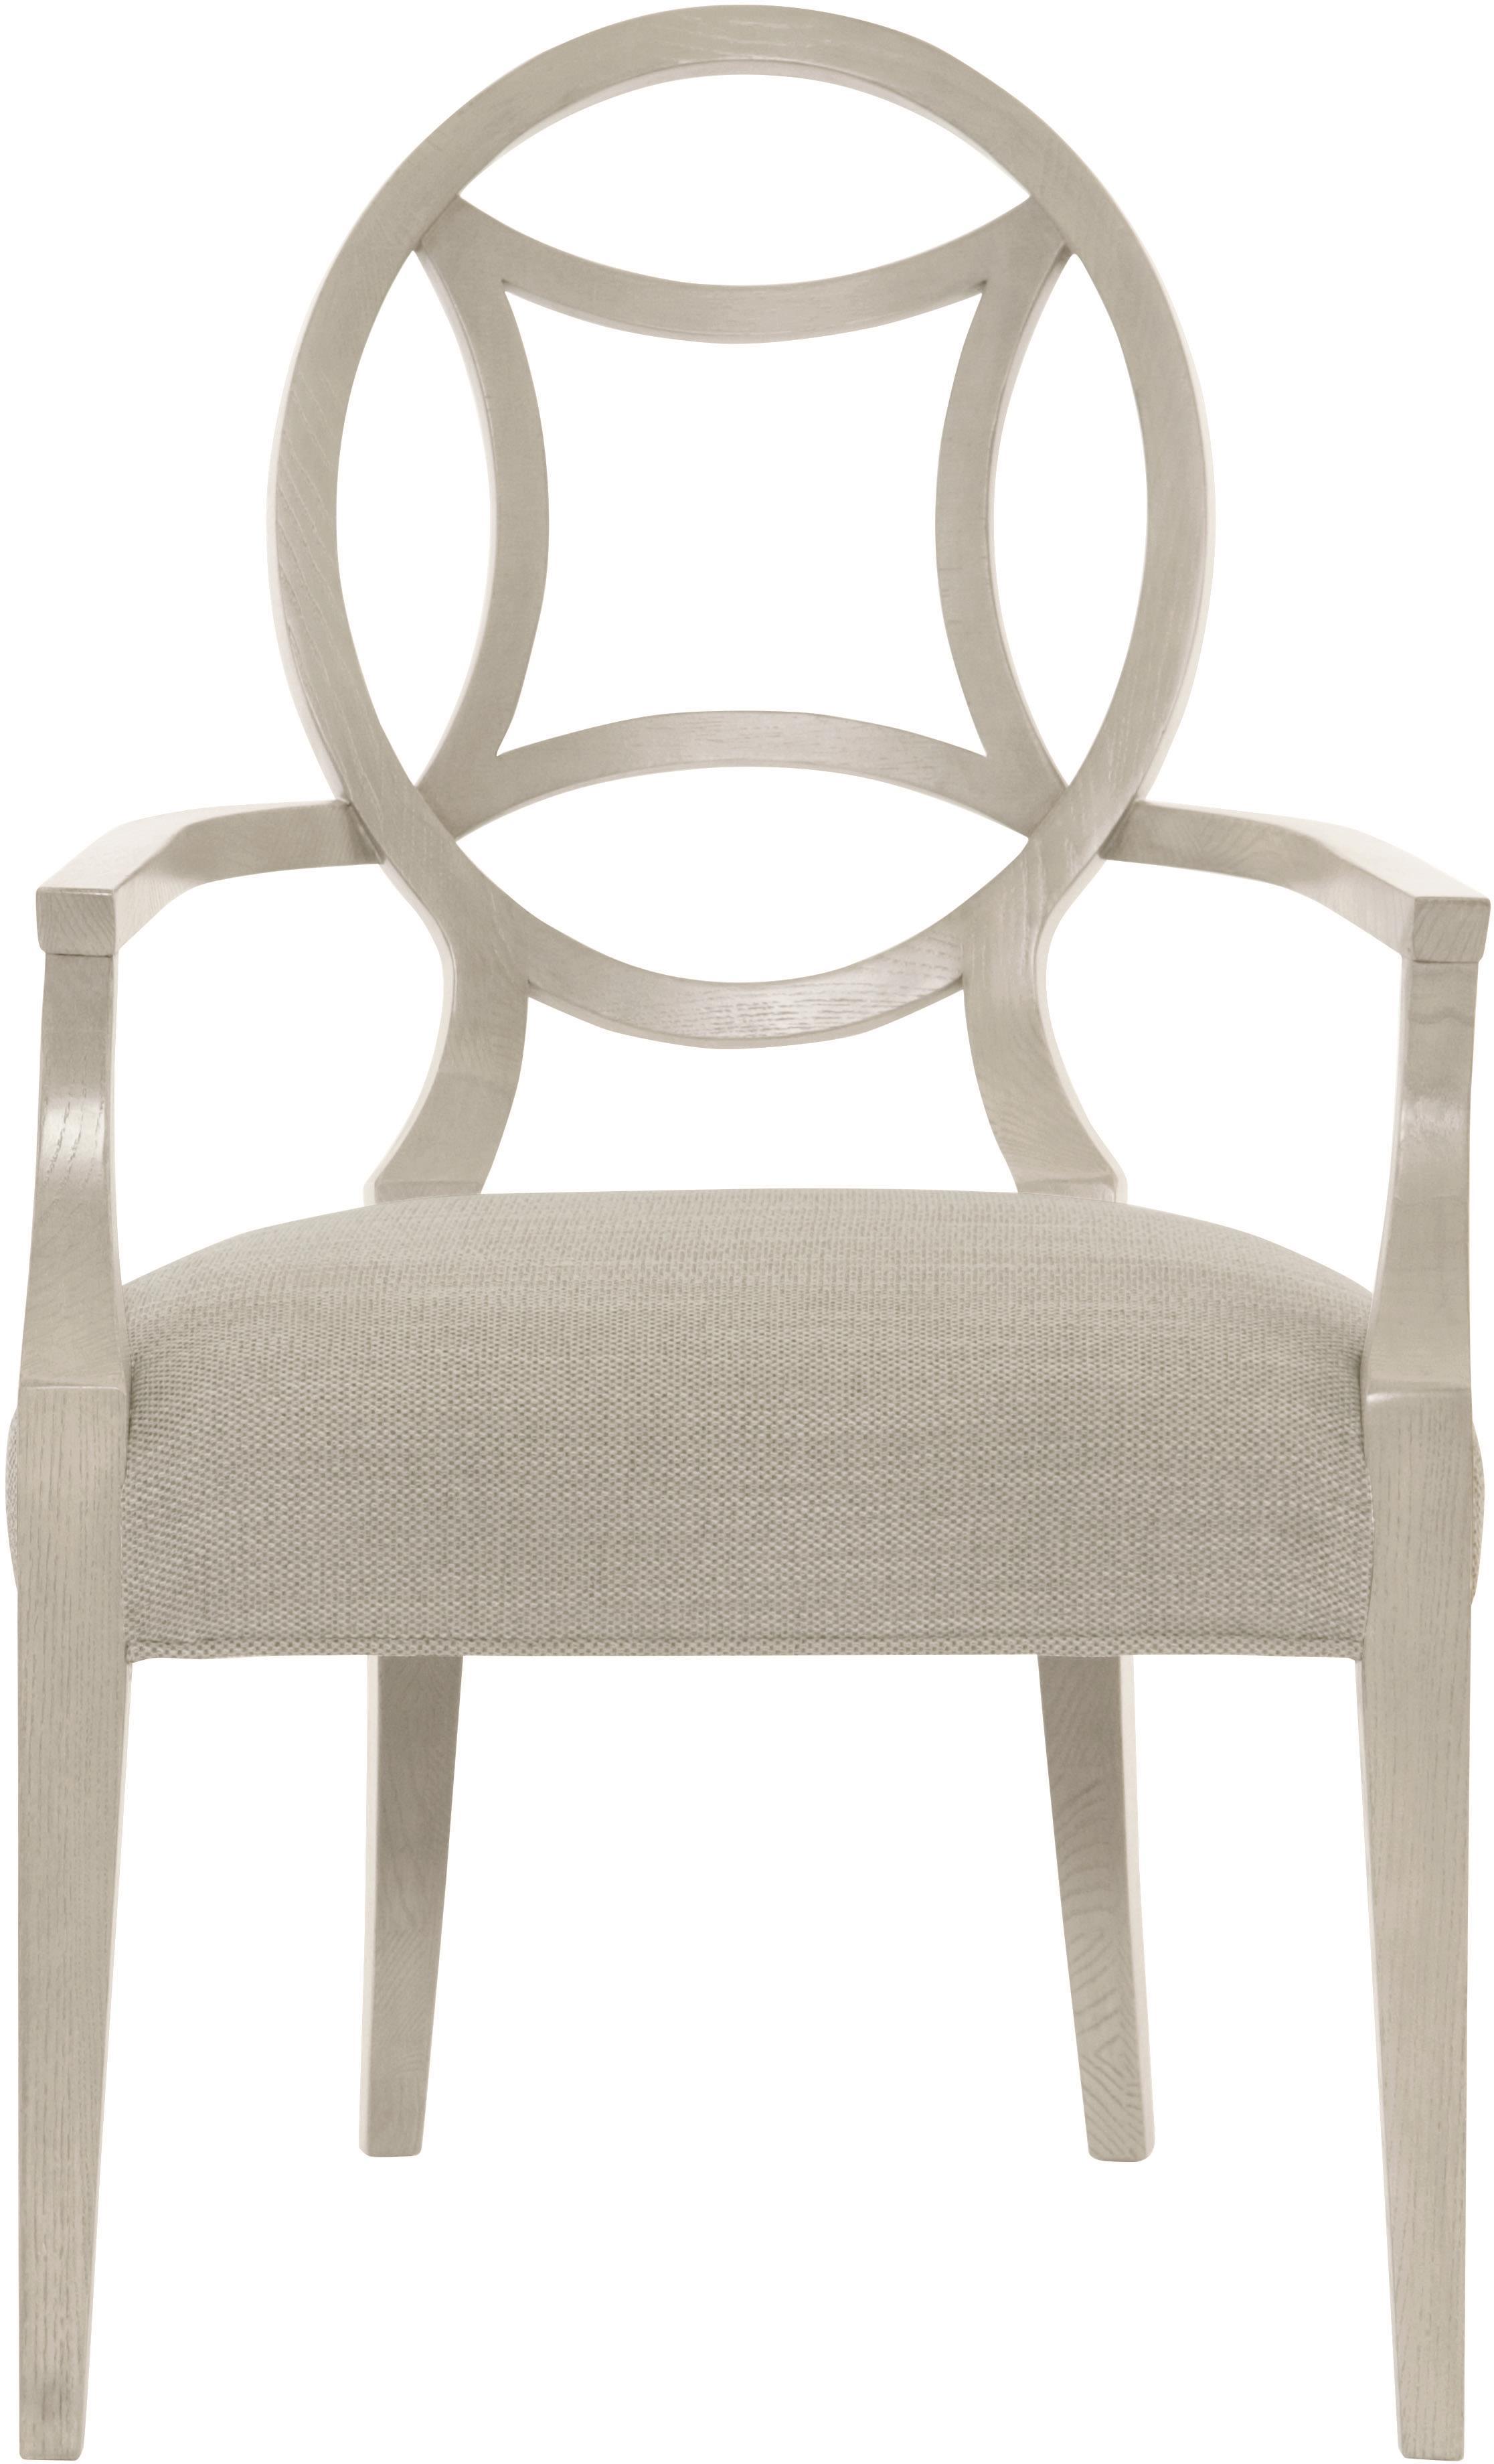 Bernhardt Criteria Arm Chair - Item Number: 363-556G